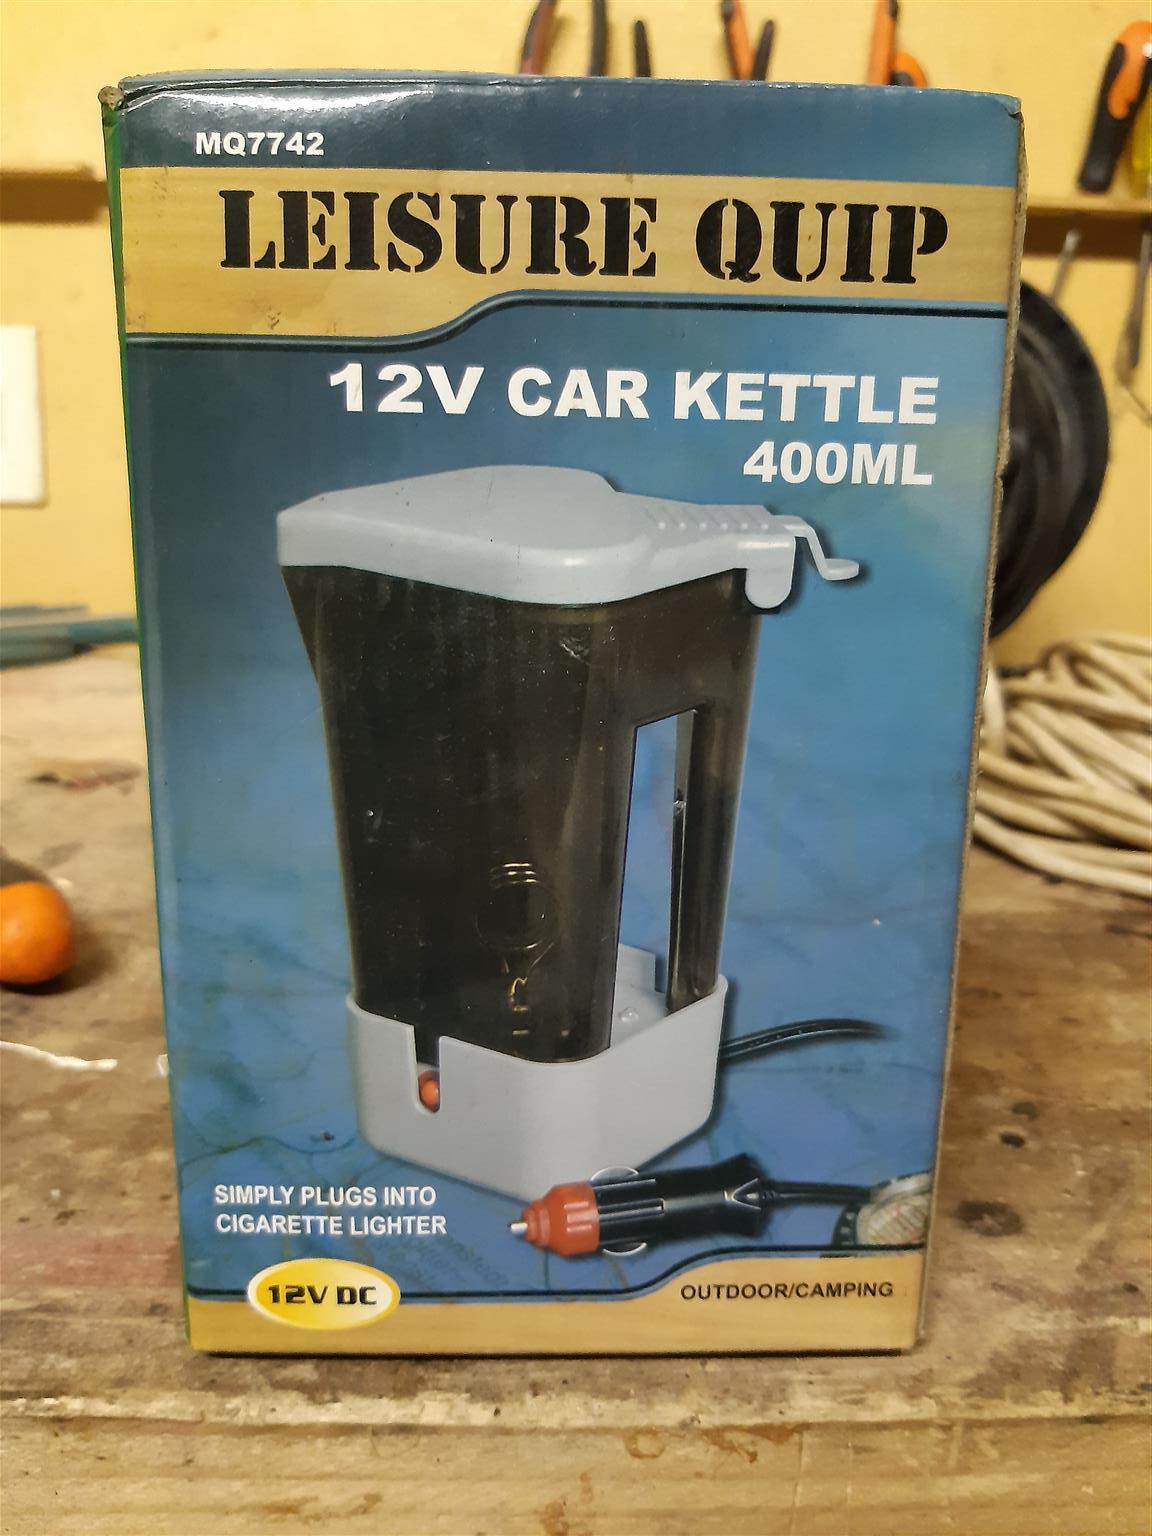 Leisure Quip 12v kettle.